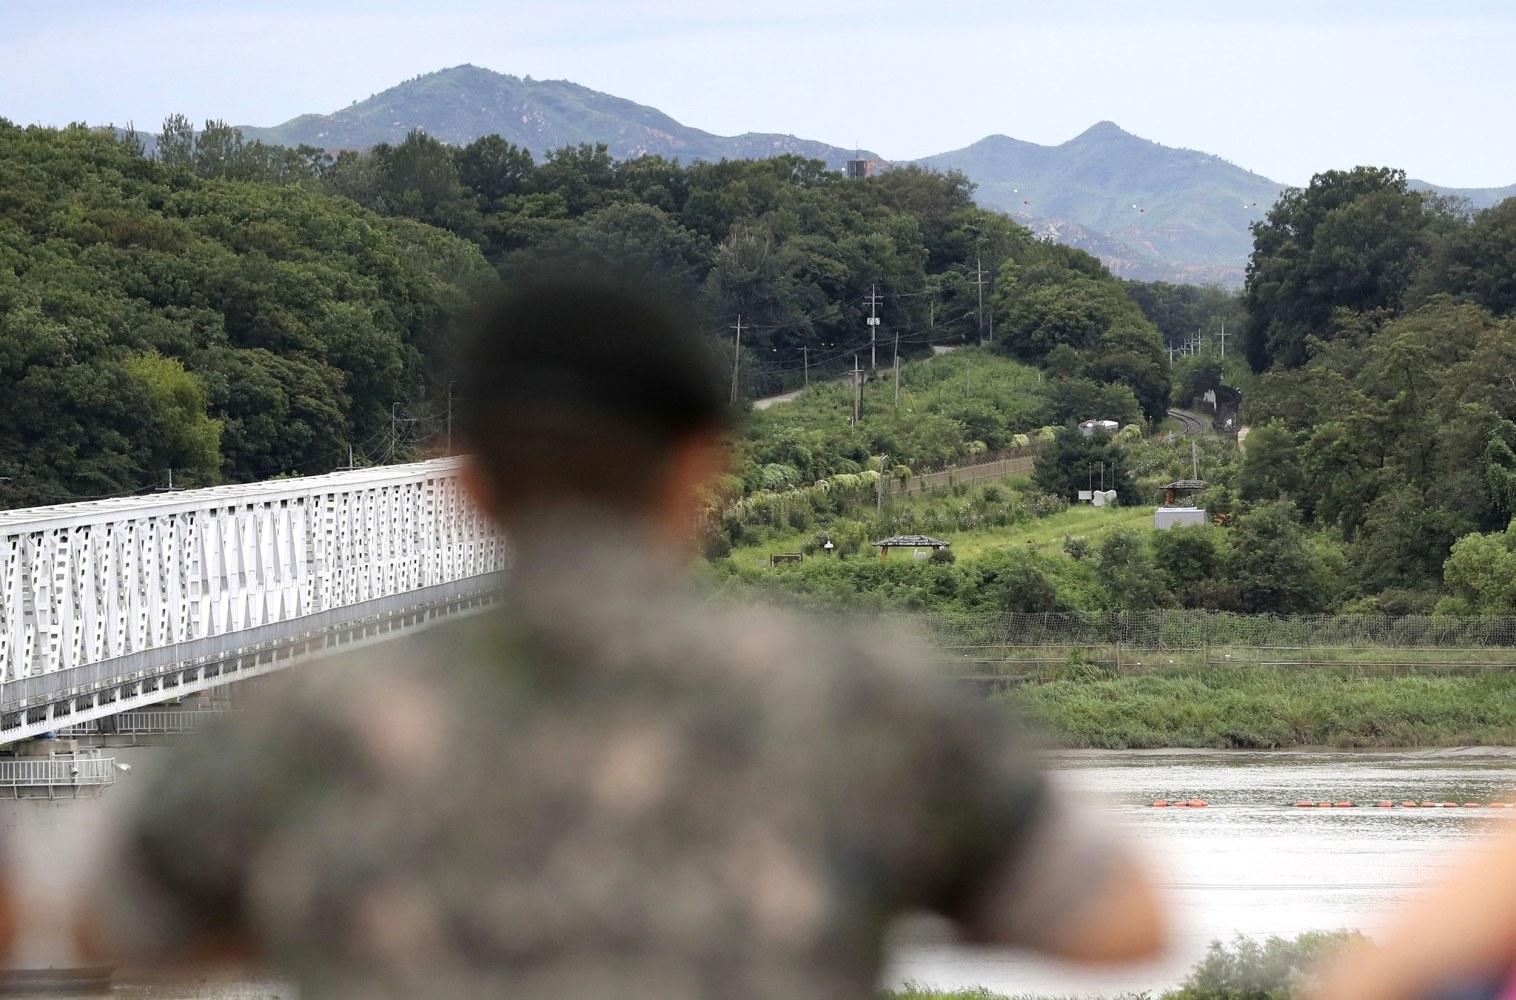 Korean troops start drills amid N. Korea standoff